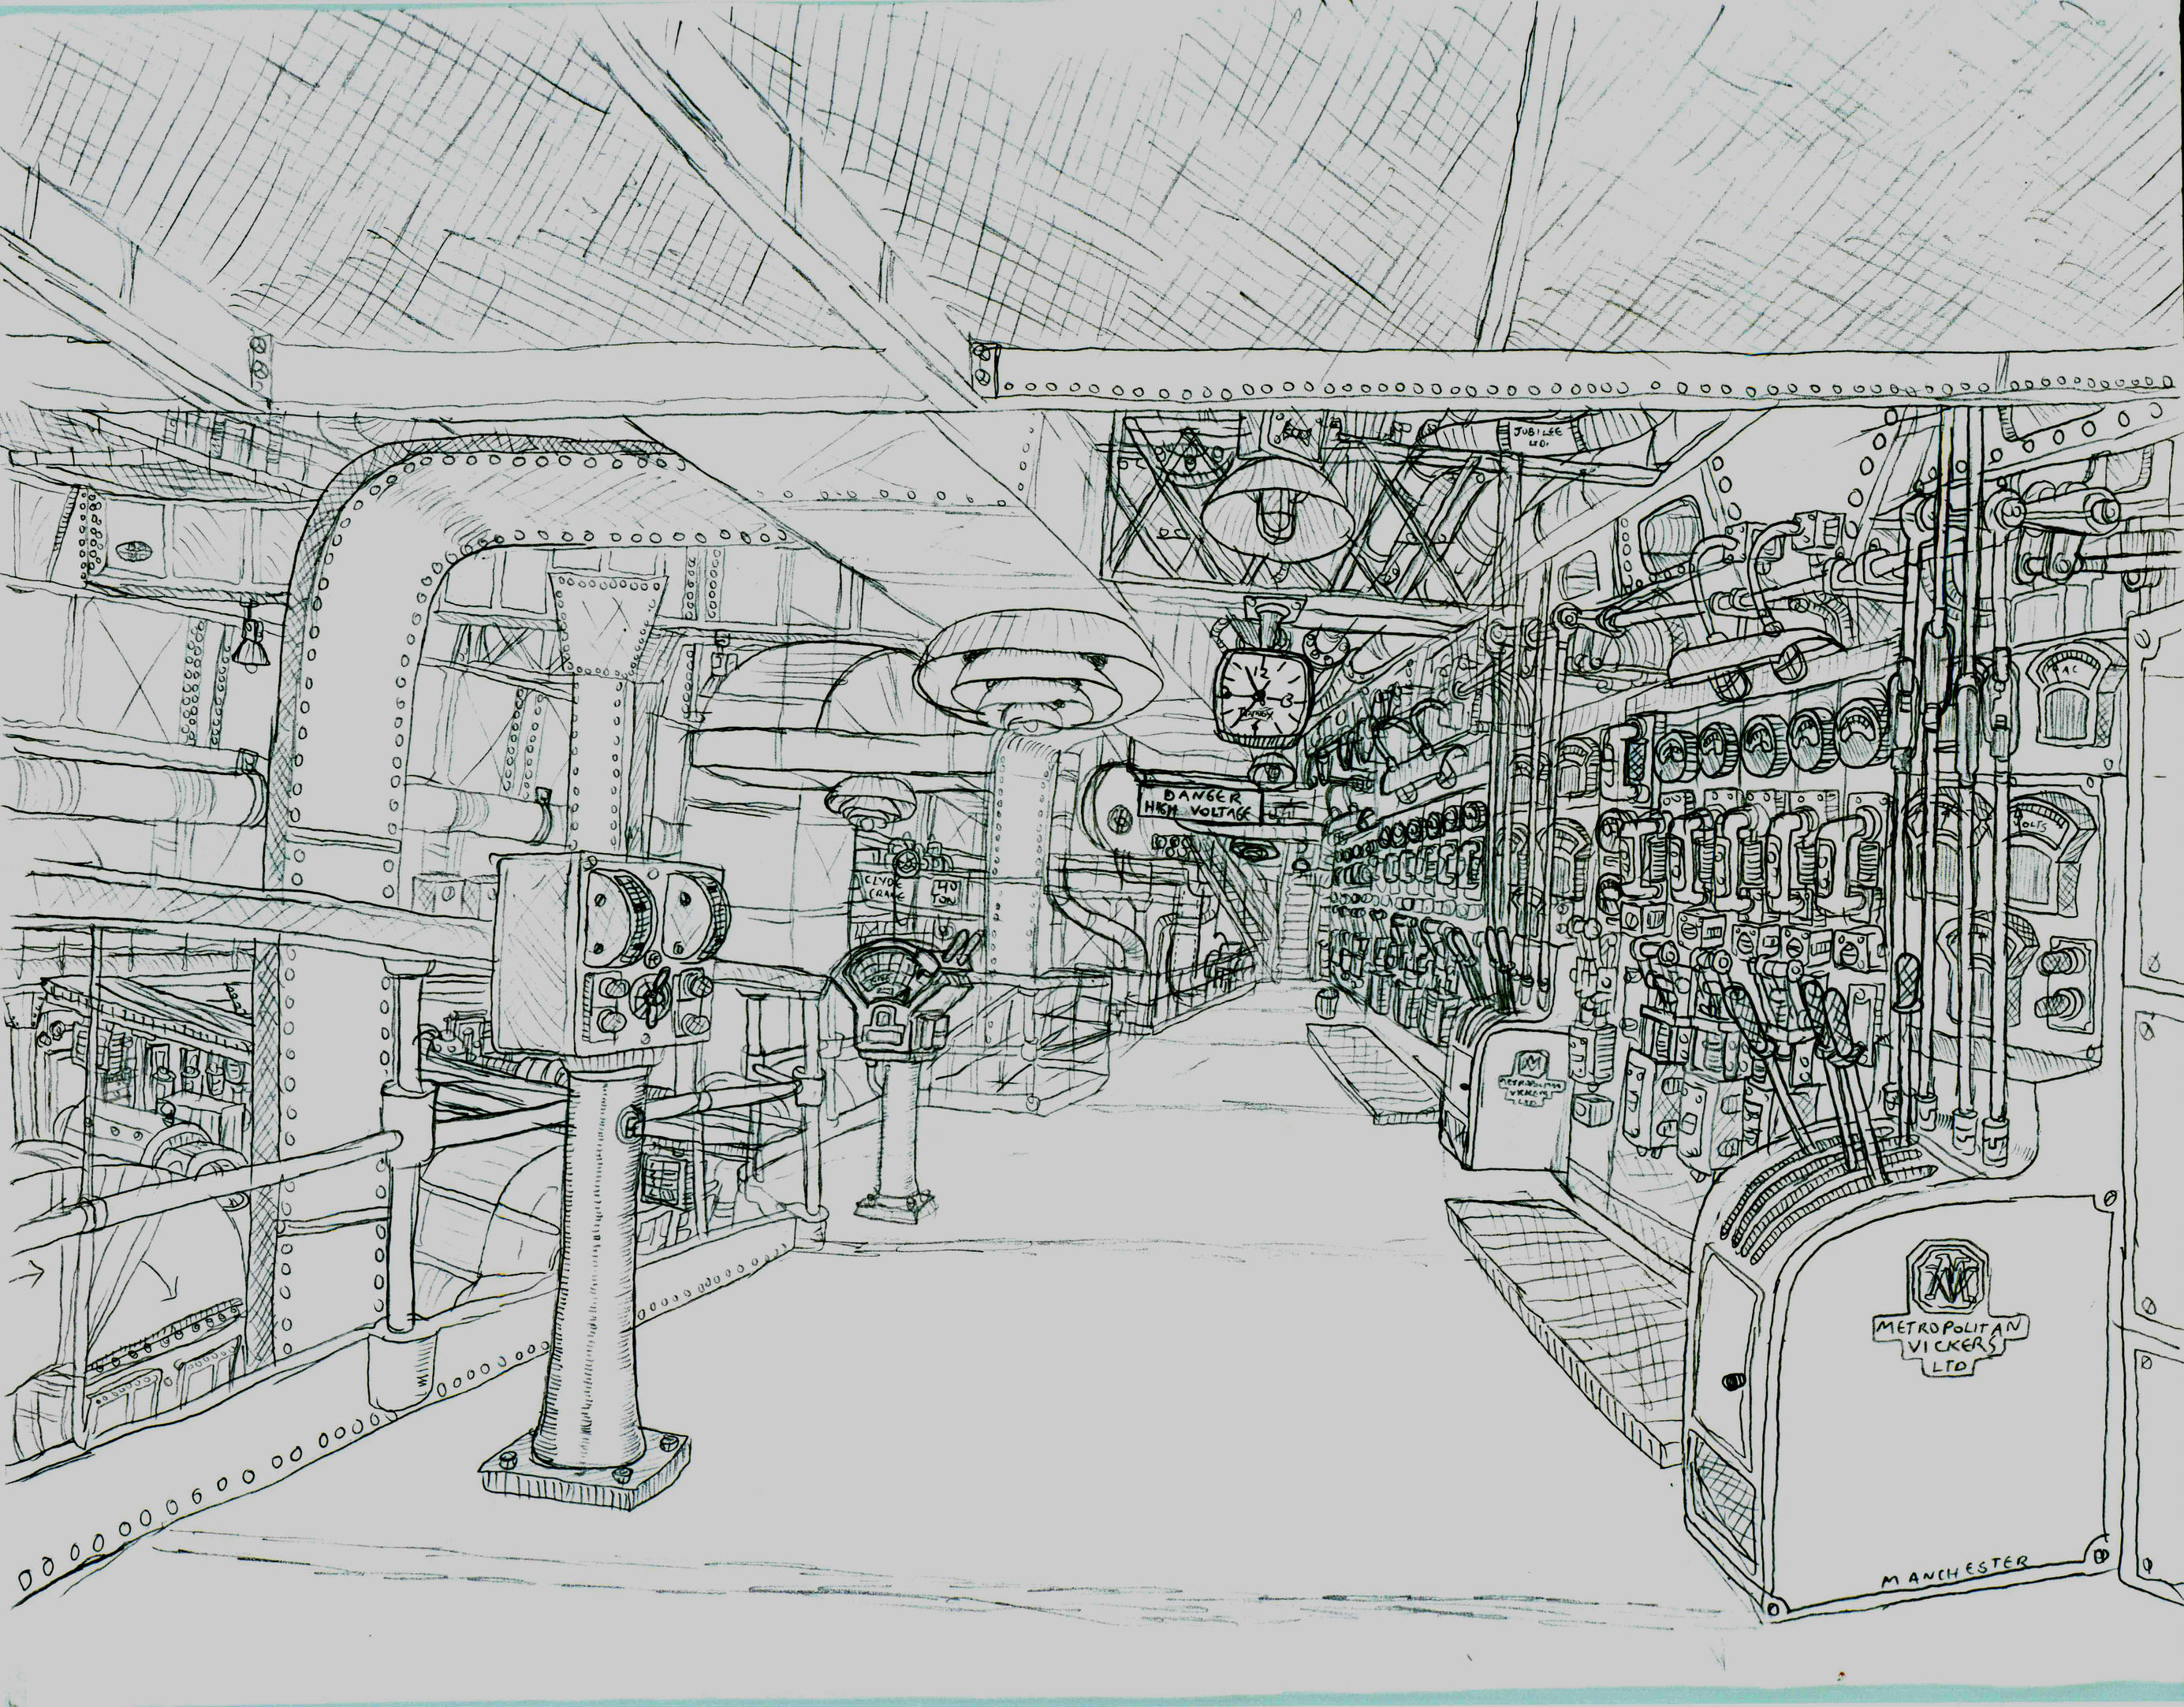 Rms London Turbogenerator Room By Ninjapickle On Deviantart